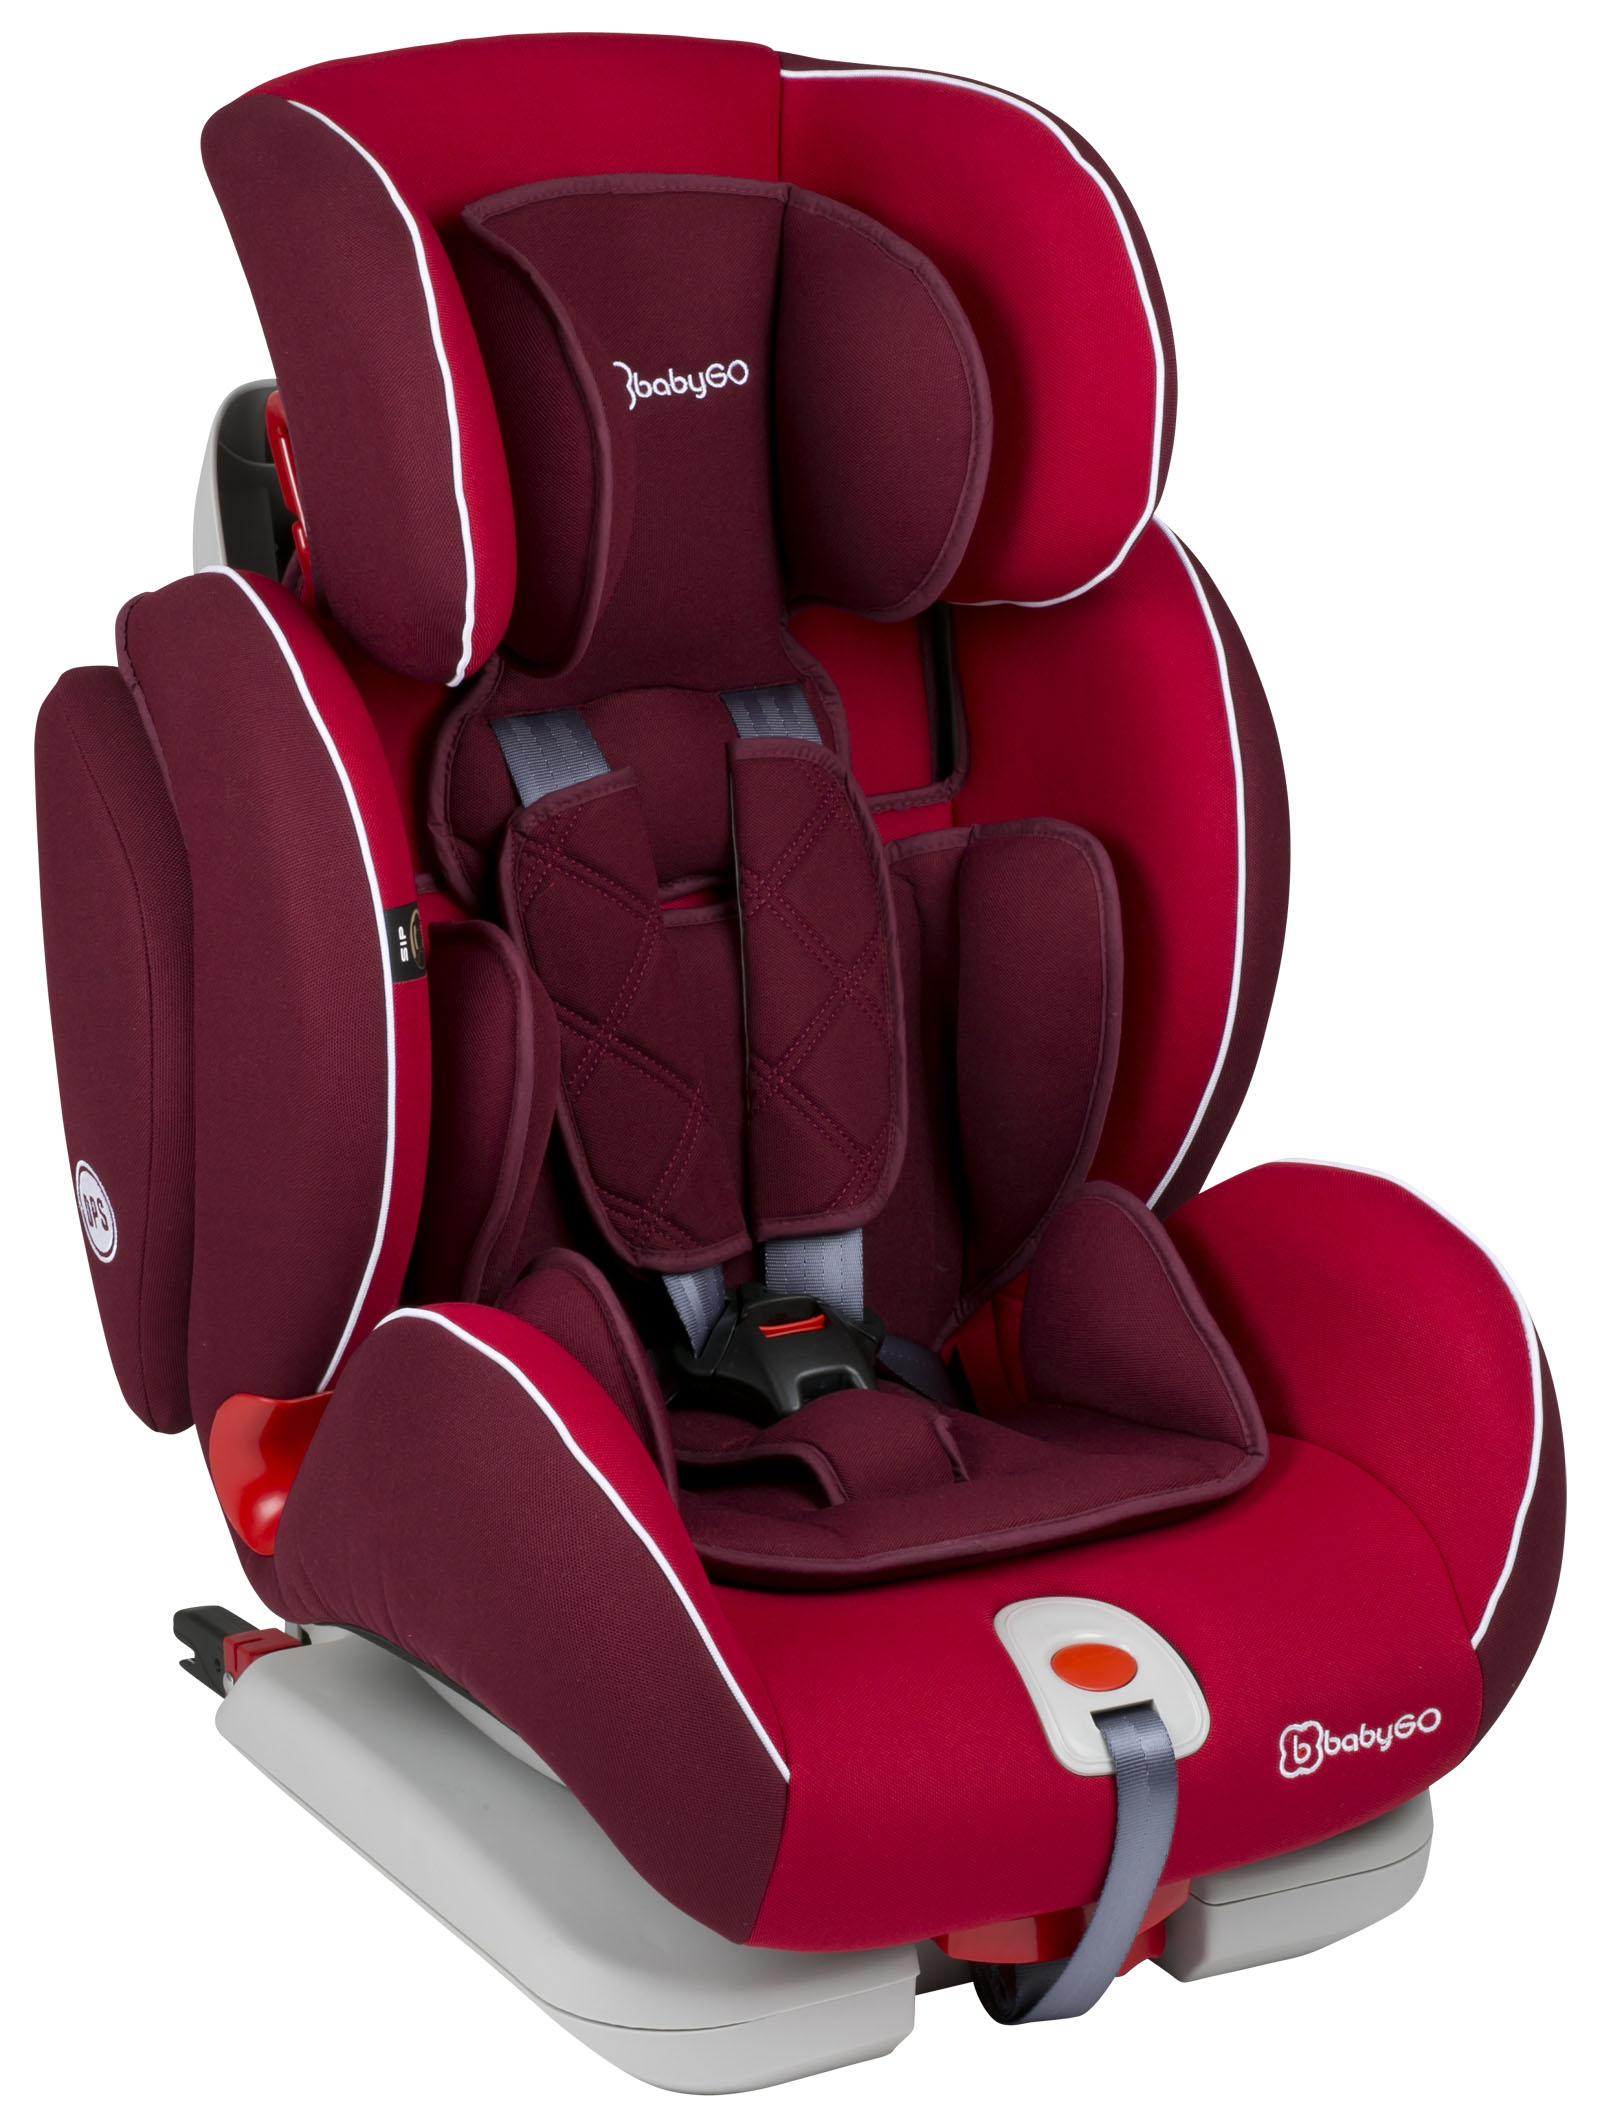 BabyGO Child Car Seat Sira 2020